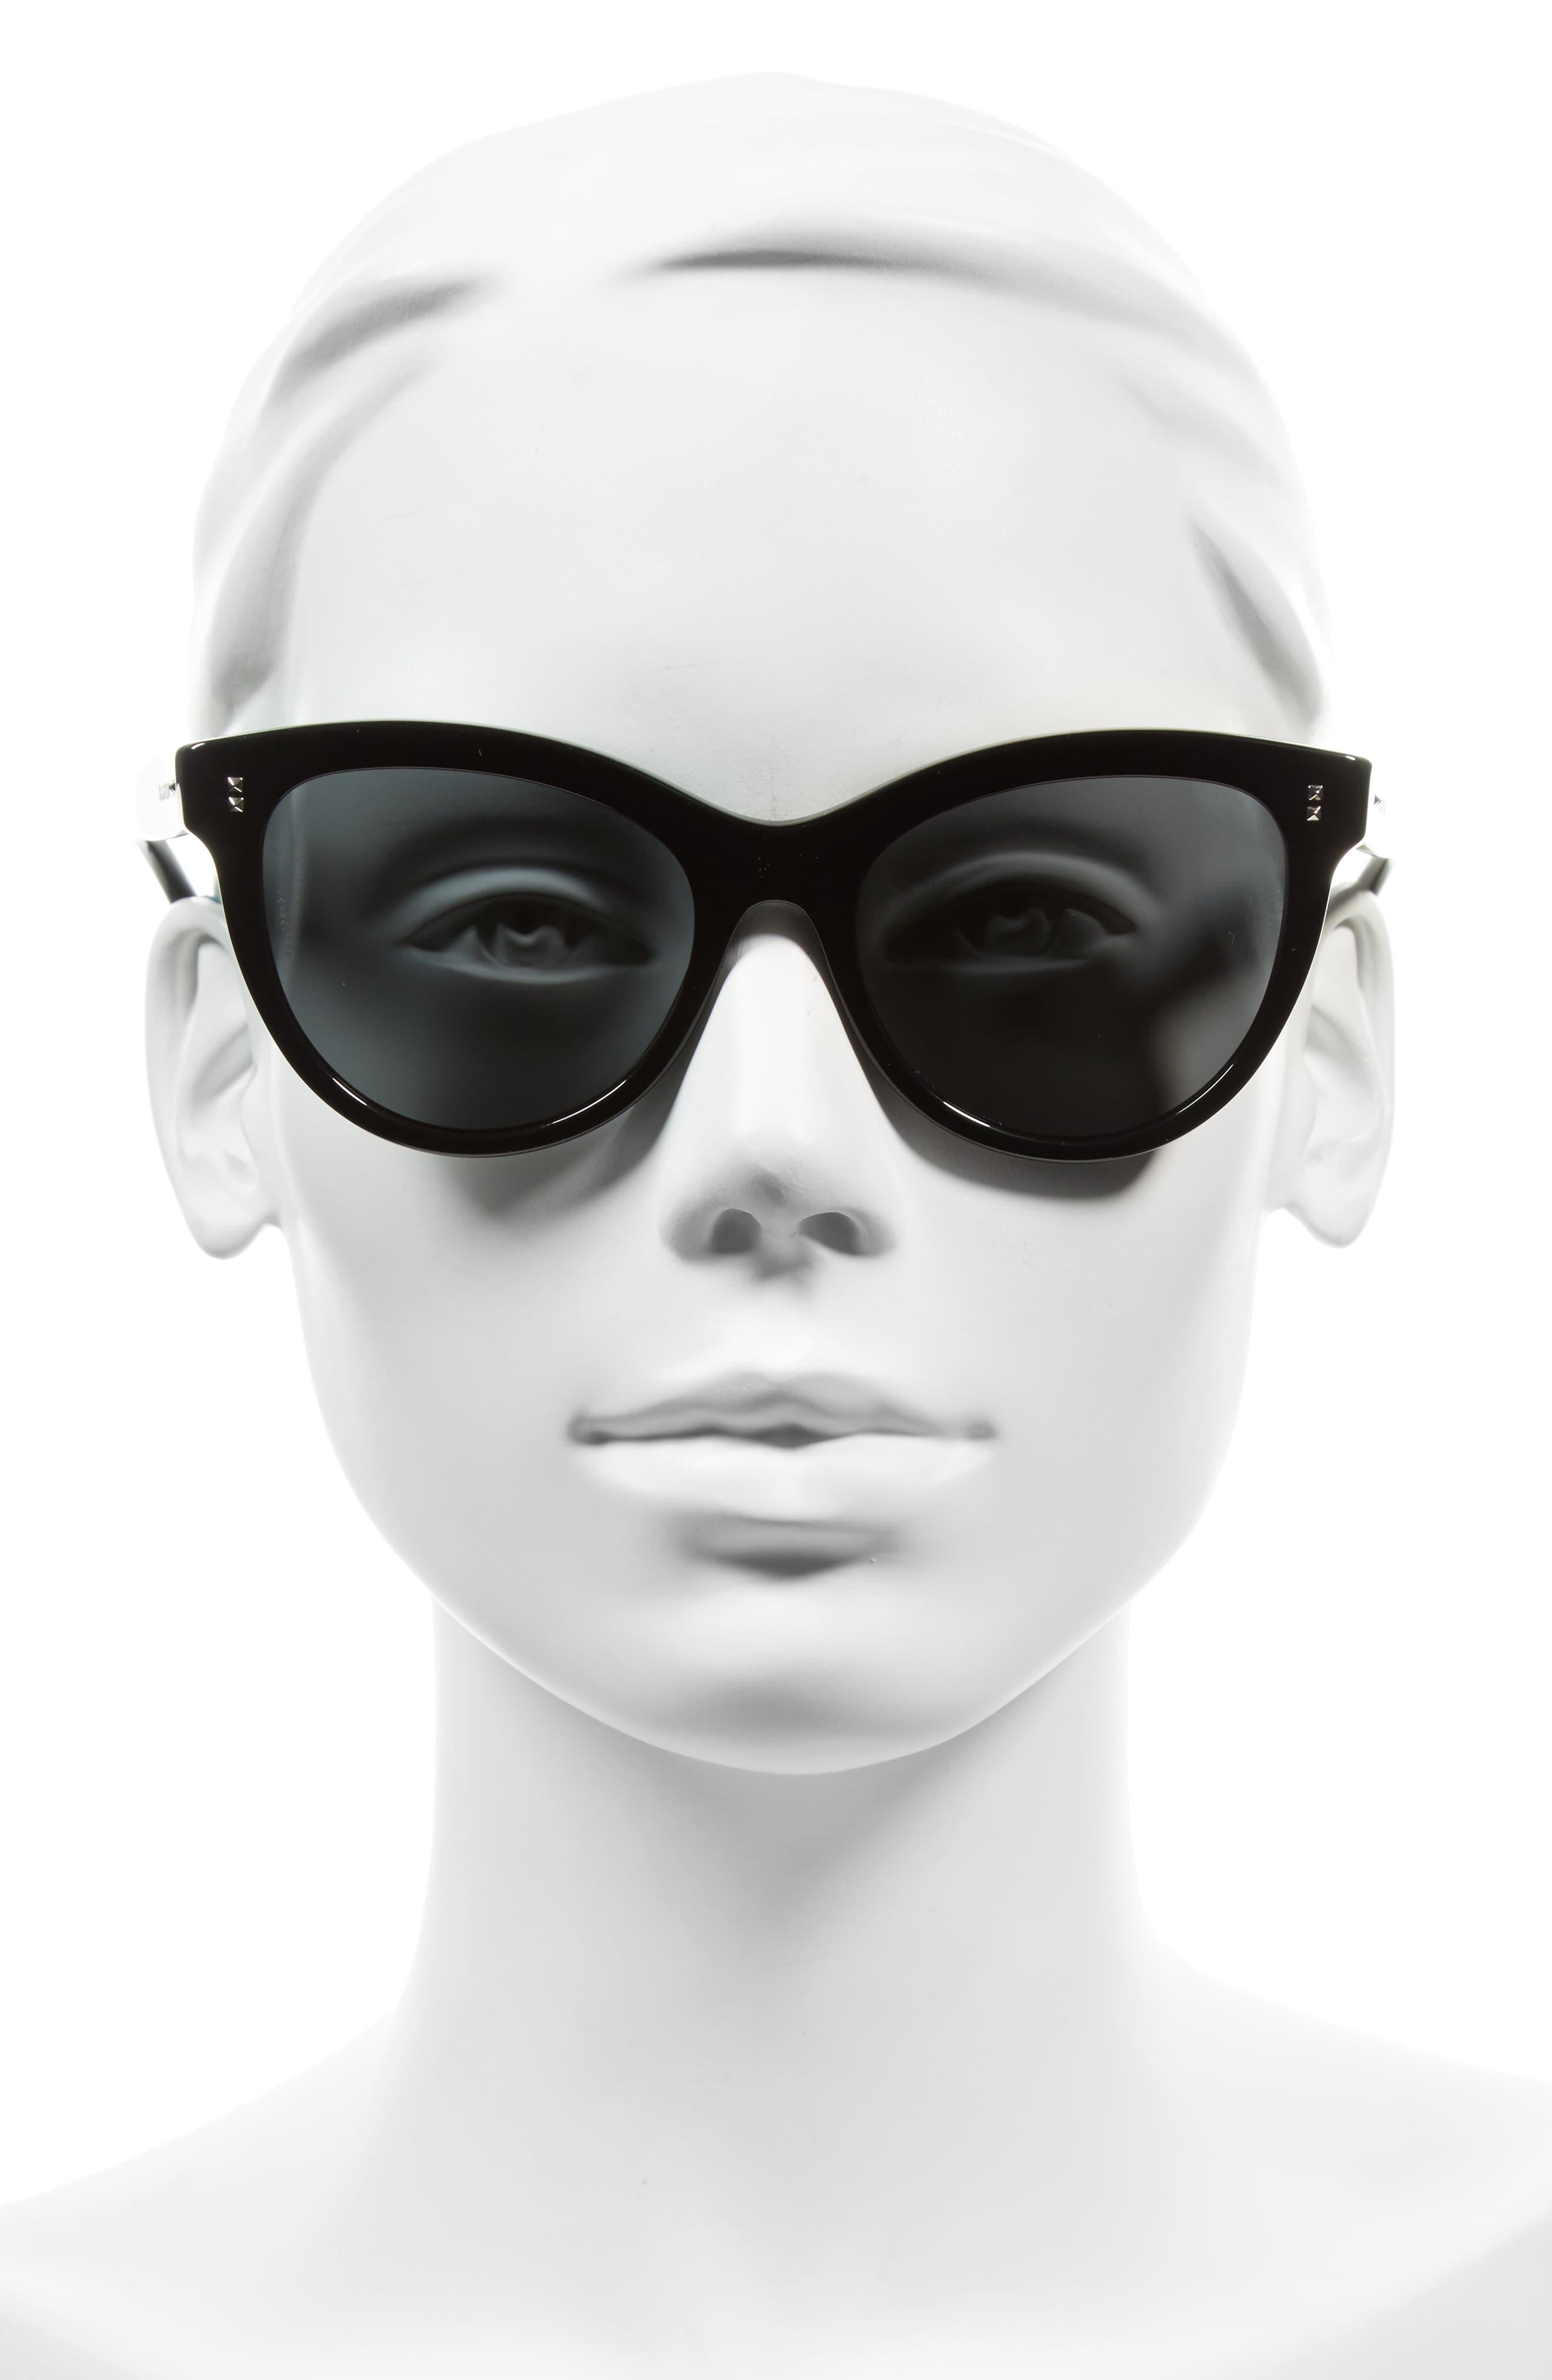 54mm Cat Eye Sunglasses,                             Alternate thumbnail 2, color,                             001